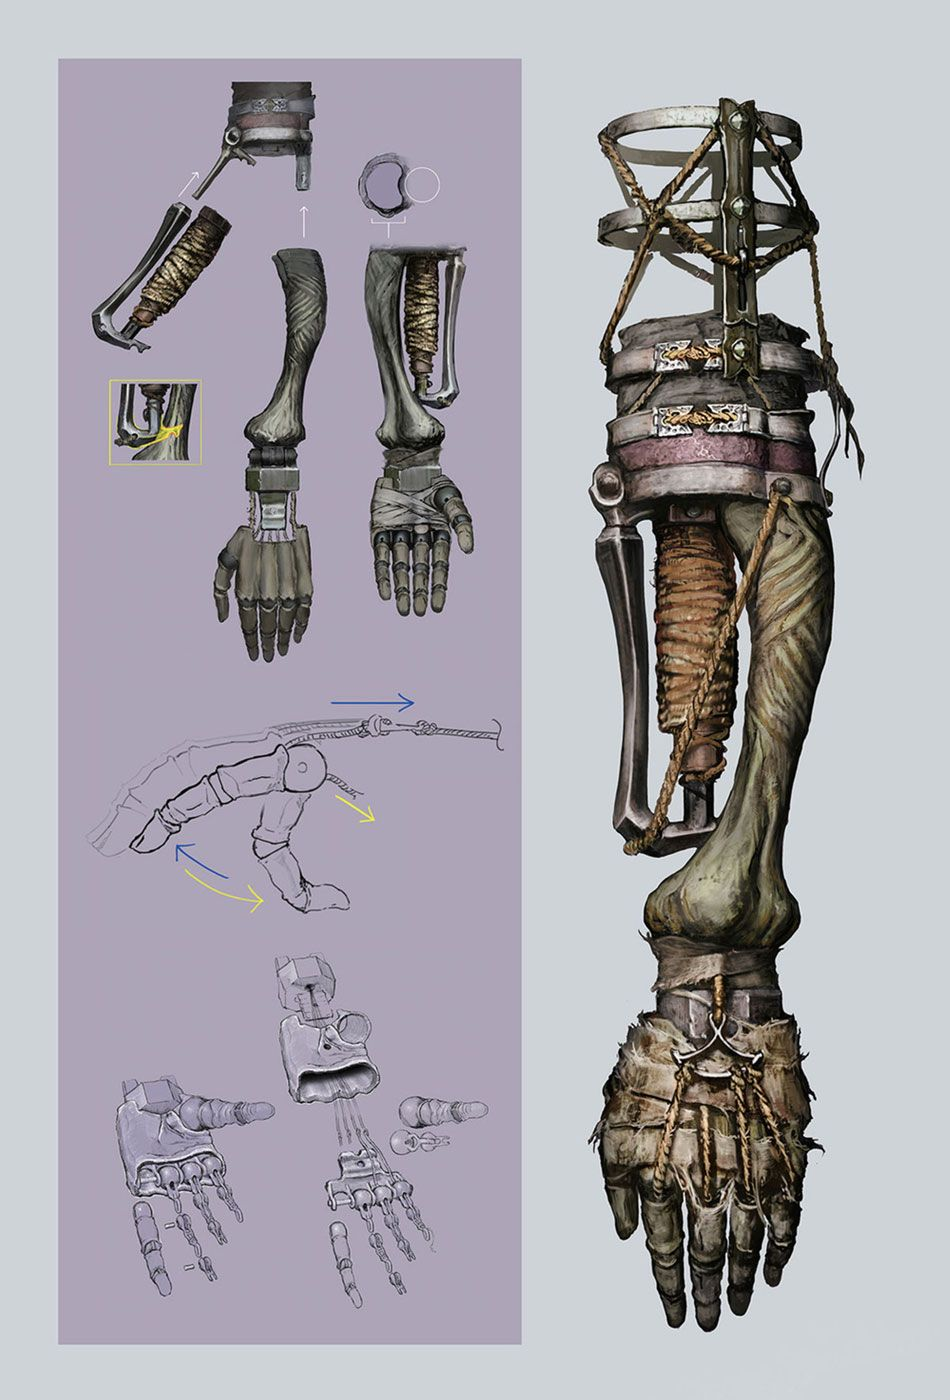 Shinobi Prosthetic Arm Art from Sekiro: Shadows Die Twice #art #artwork #gaming #videogames #gamer #gameart #conceptart #illustration #sekiro #sekiroshadowsdietwice